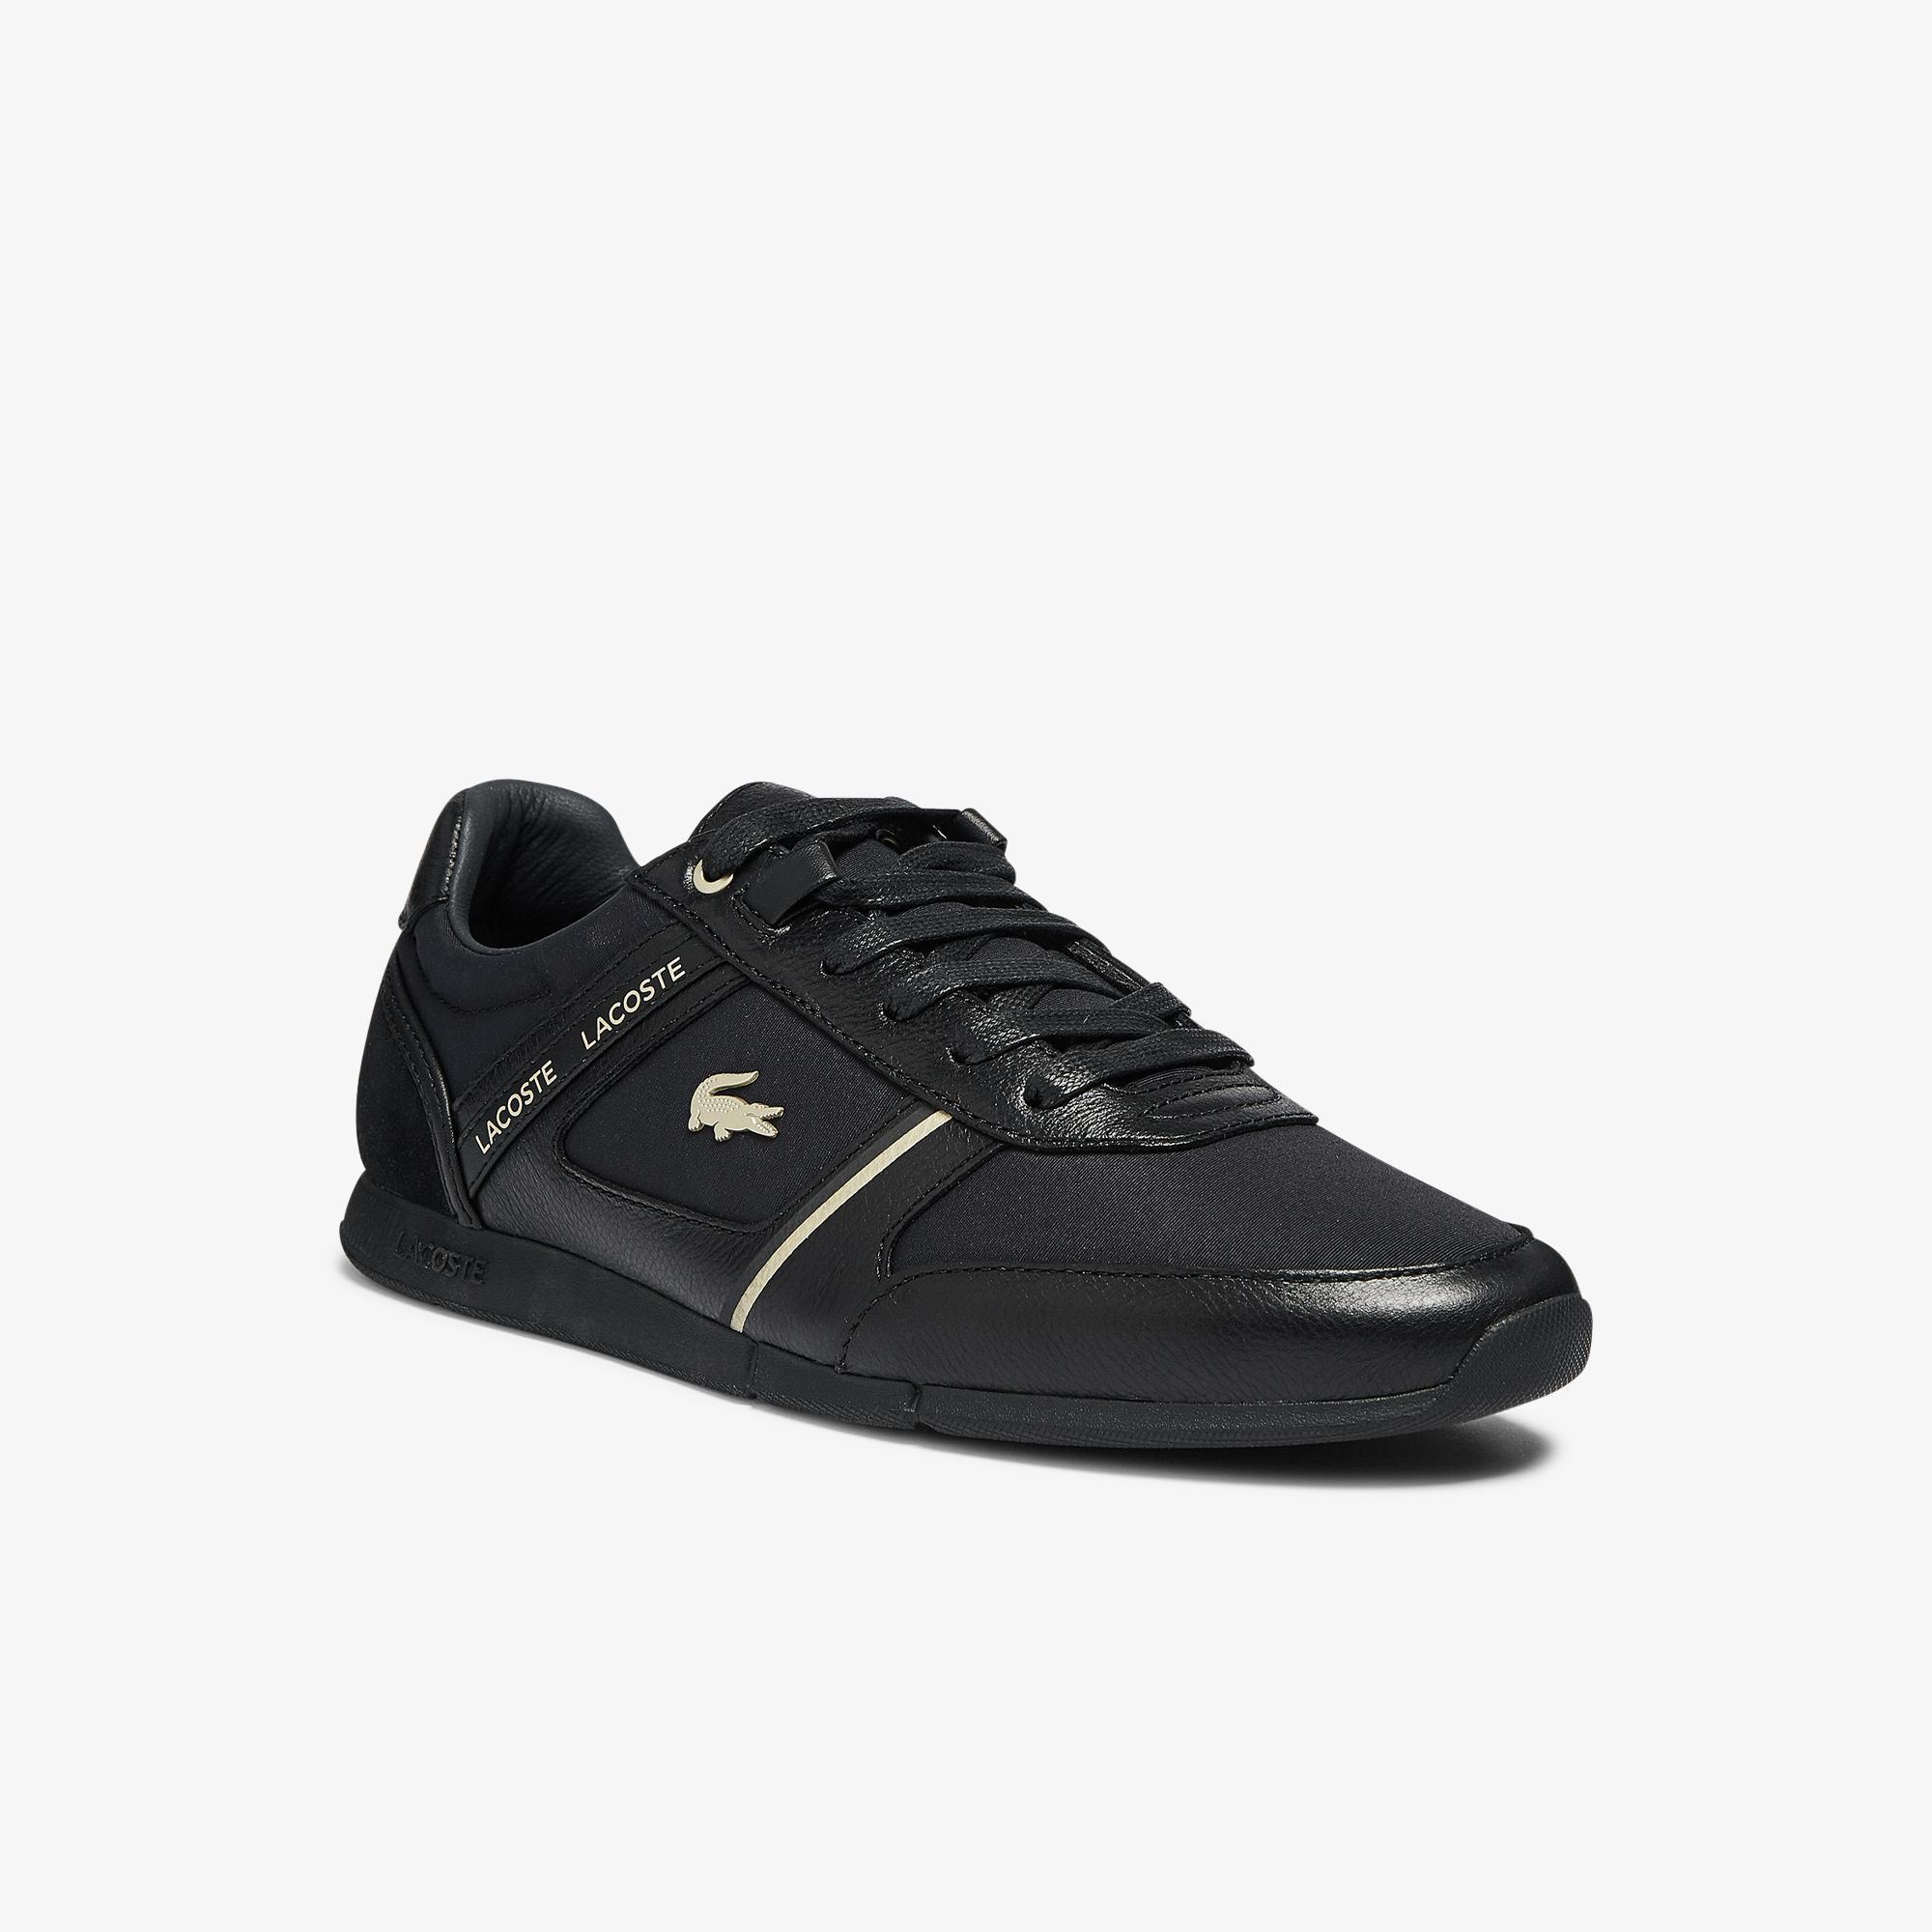 Lacoste Menerva 0921 1 Cma Erkek Siyah - Antrasit Sneaker